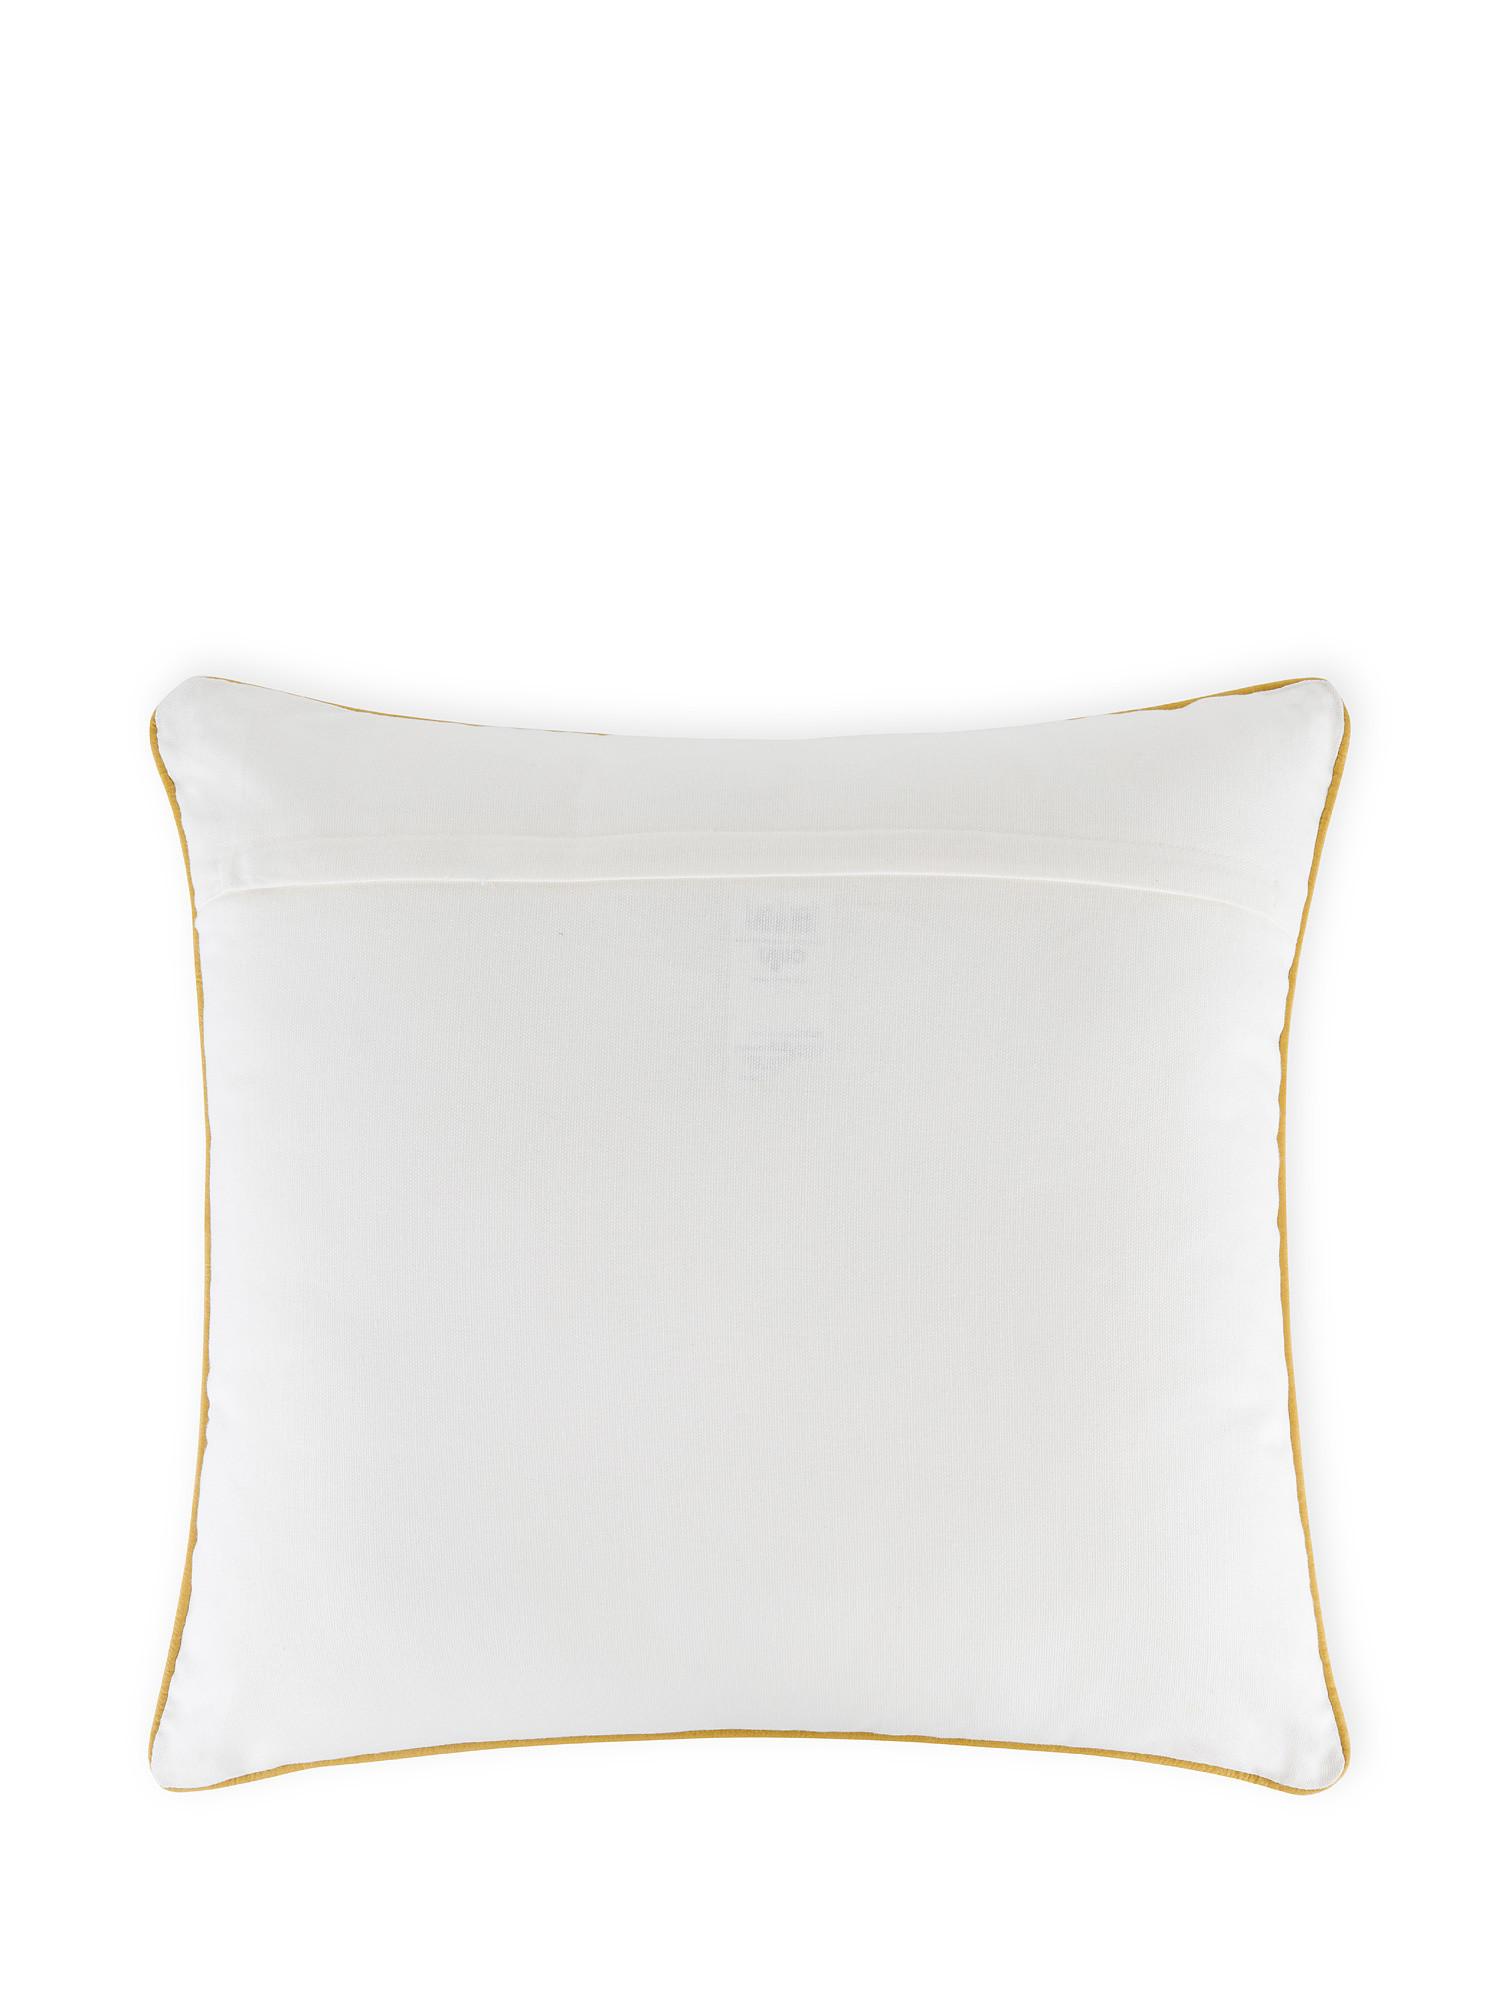 Cuscino cotone ricamo foglie 45x45cm, Multicolor, large image number 1